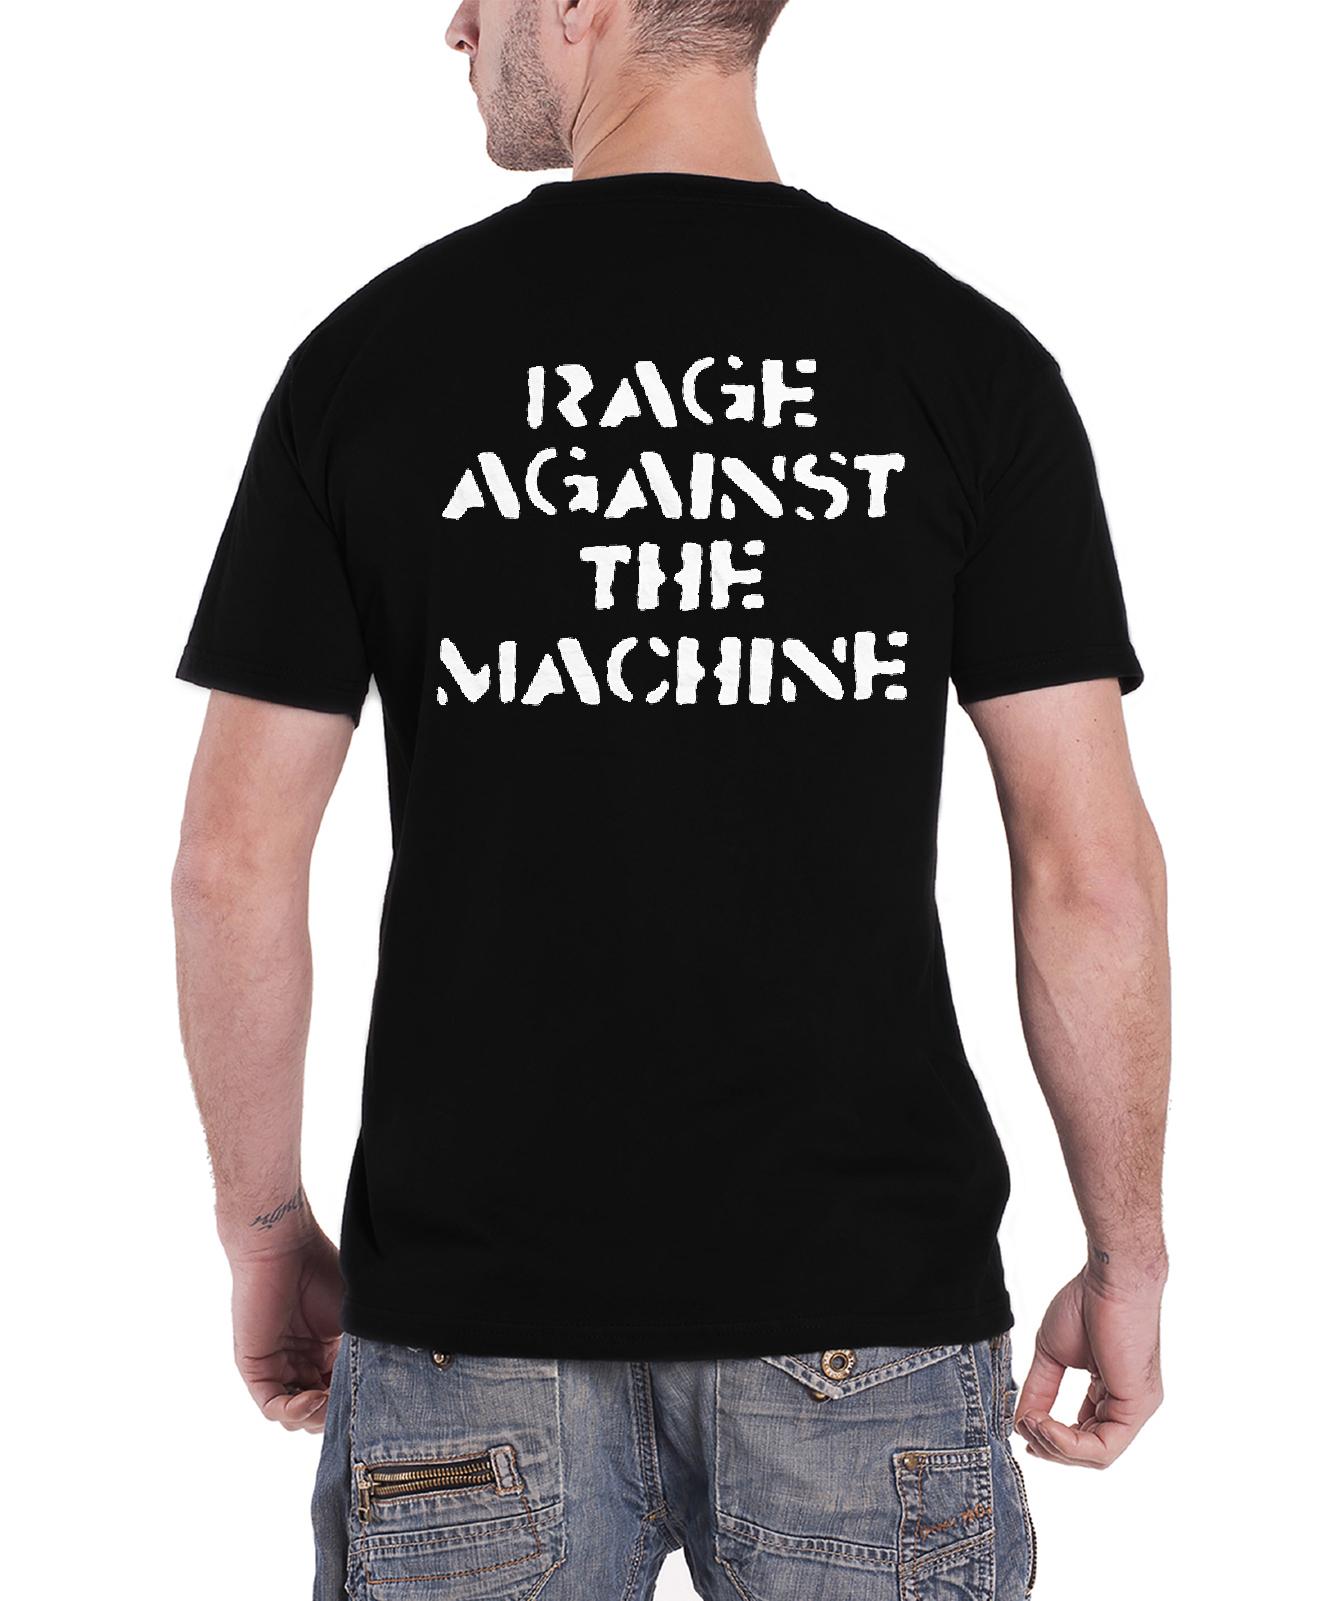 Rage Against the Machine - iHeartRadio